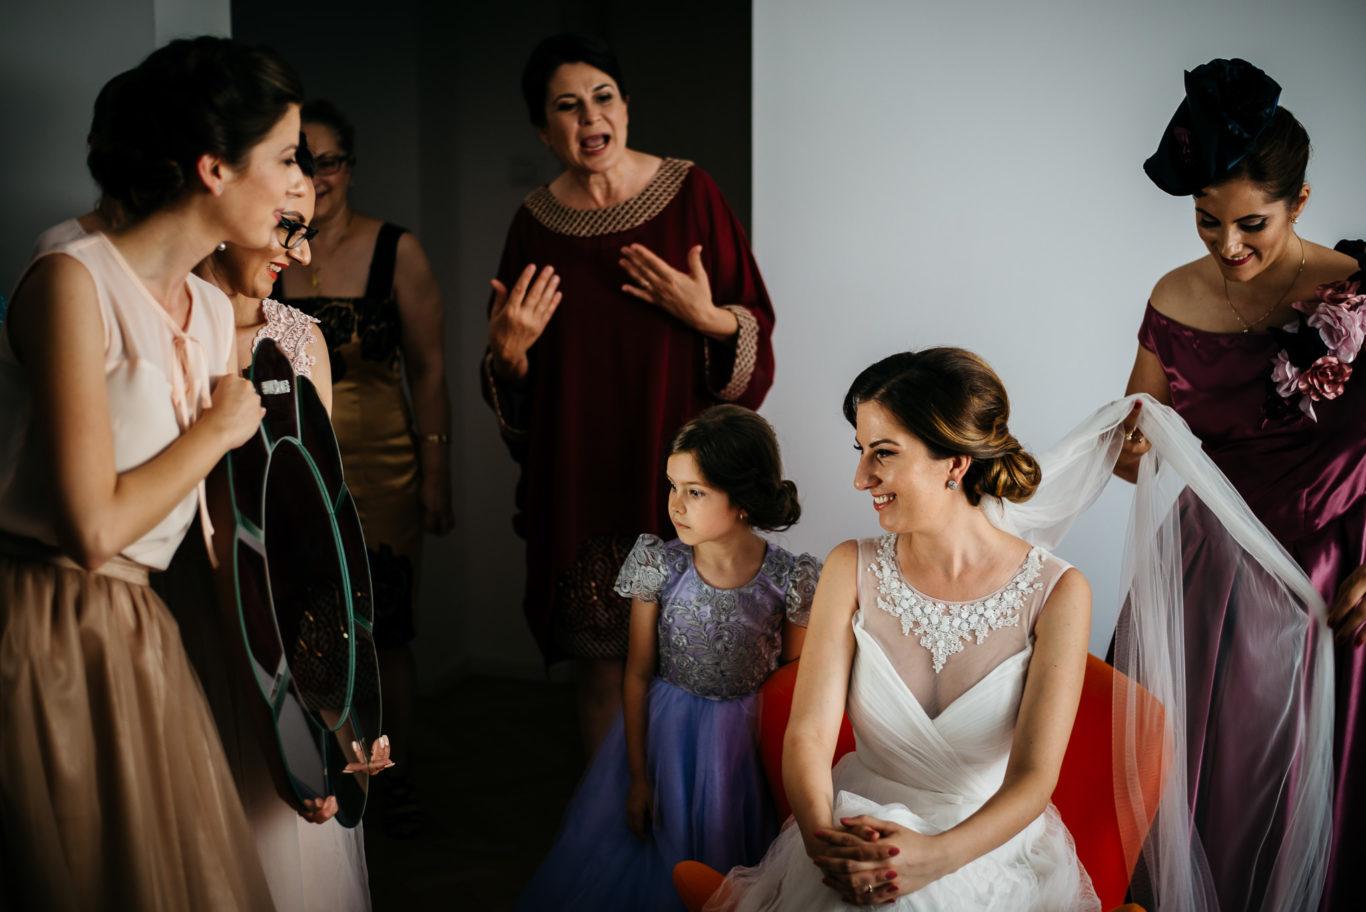 0189-Fotografie-nunta-Bucuresti-Oana-Catalin-fotograf-Ciprian-Dumitrescu-DSC_3850